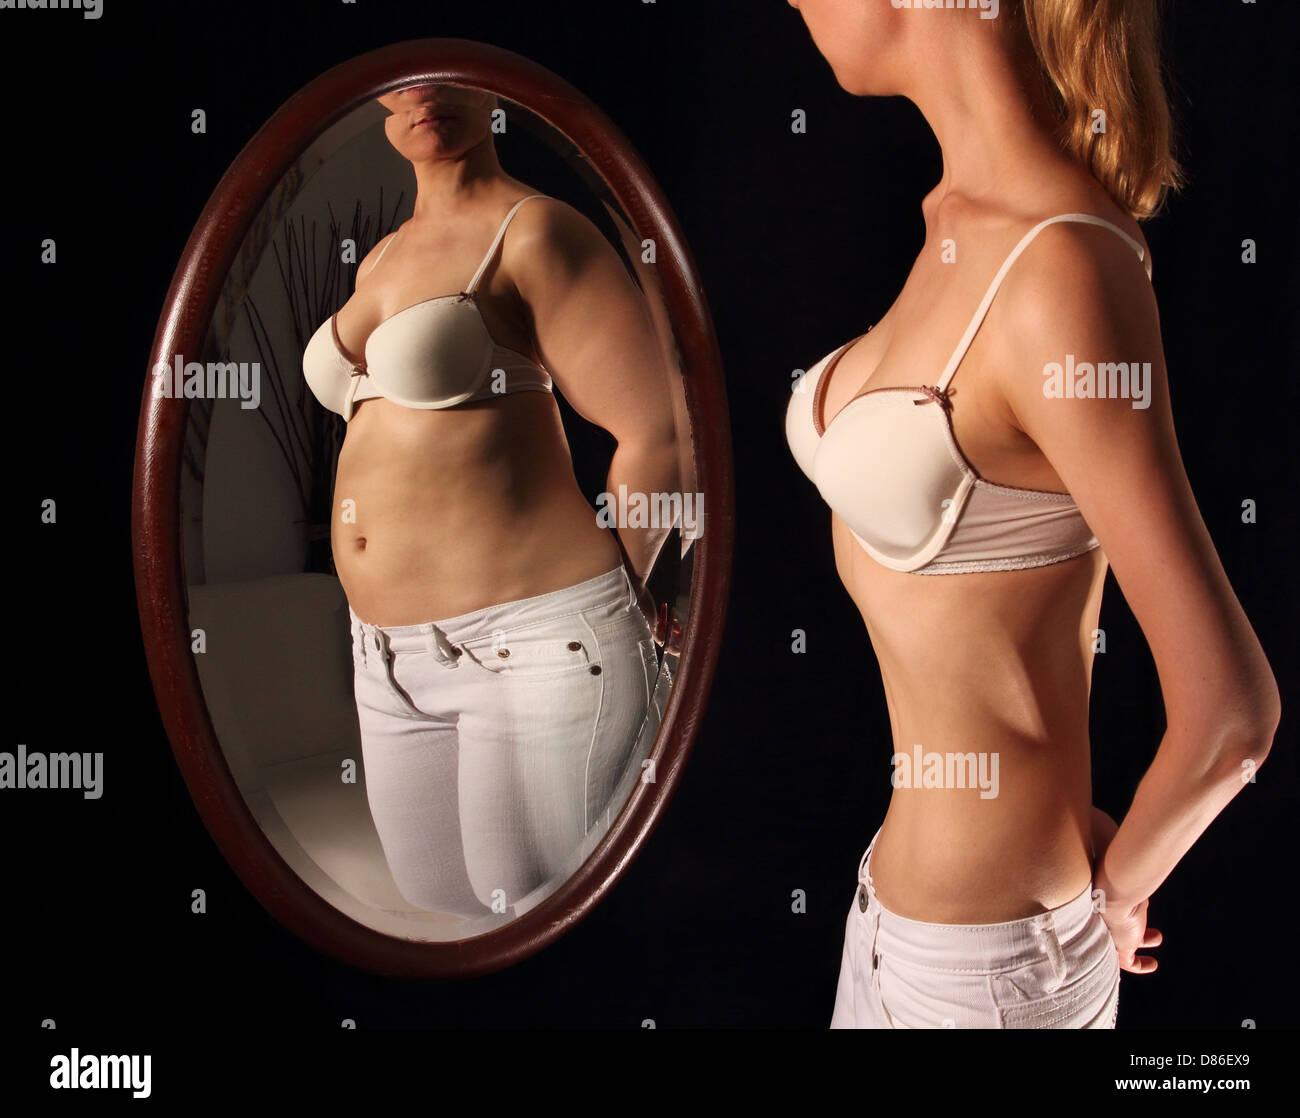 4198d0afdf6870 Skinny Fat Stockfotos & Skinny Fat Bilder - Alamy